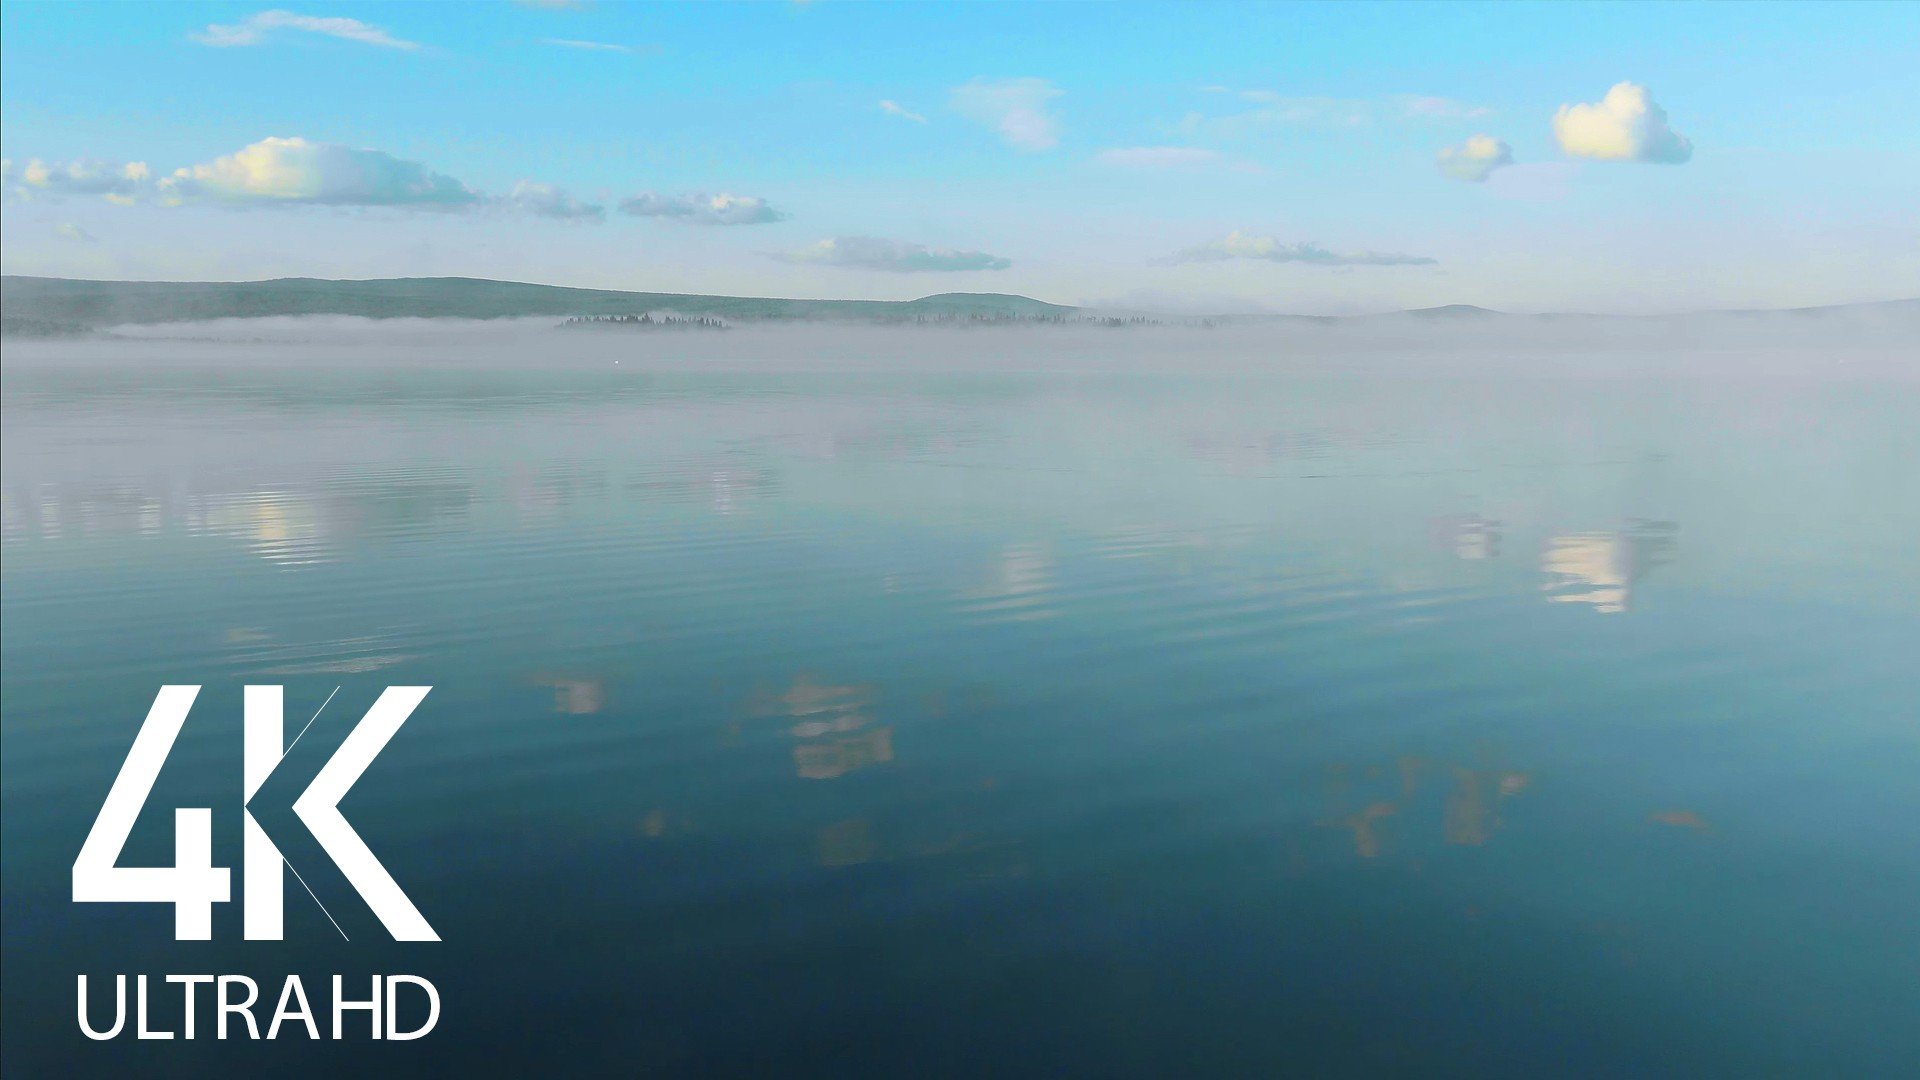 Peaceful_morning_at_Zyuratkul_Lake_Chelyabinsk_Oblast,_Russia